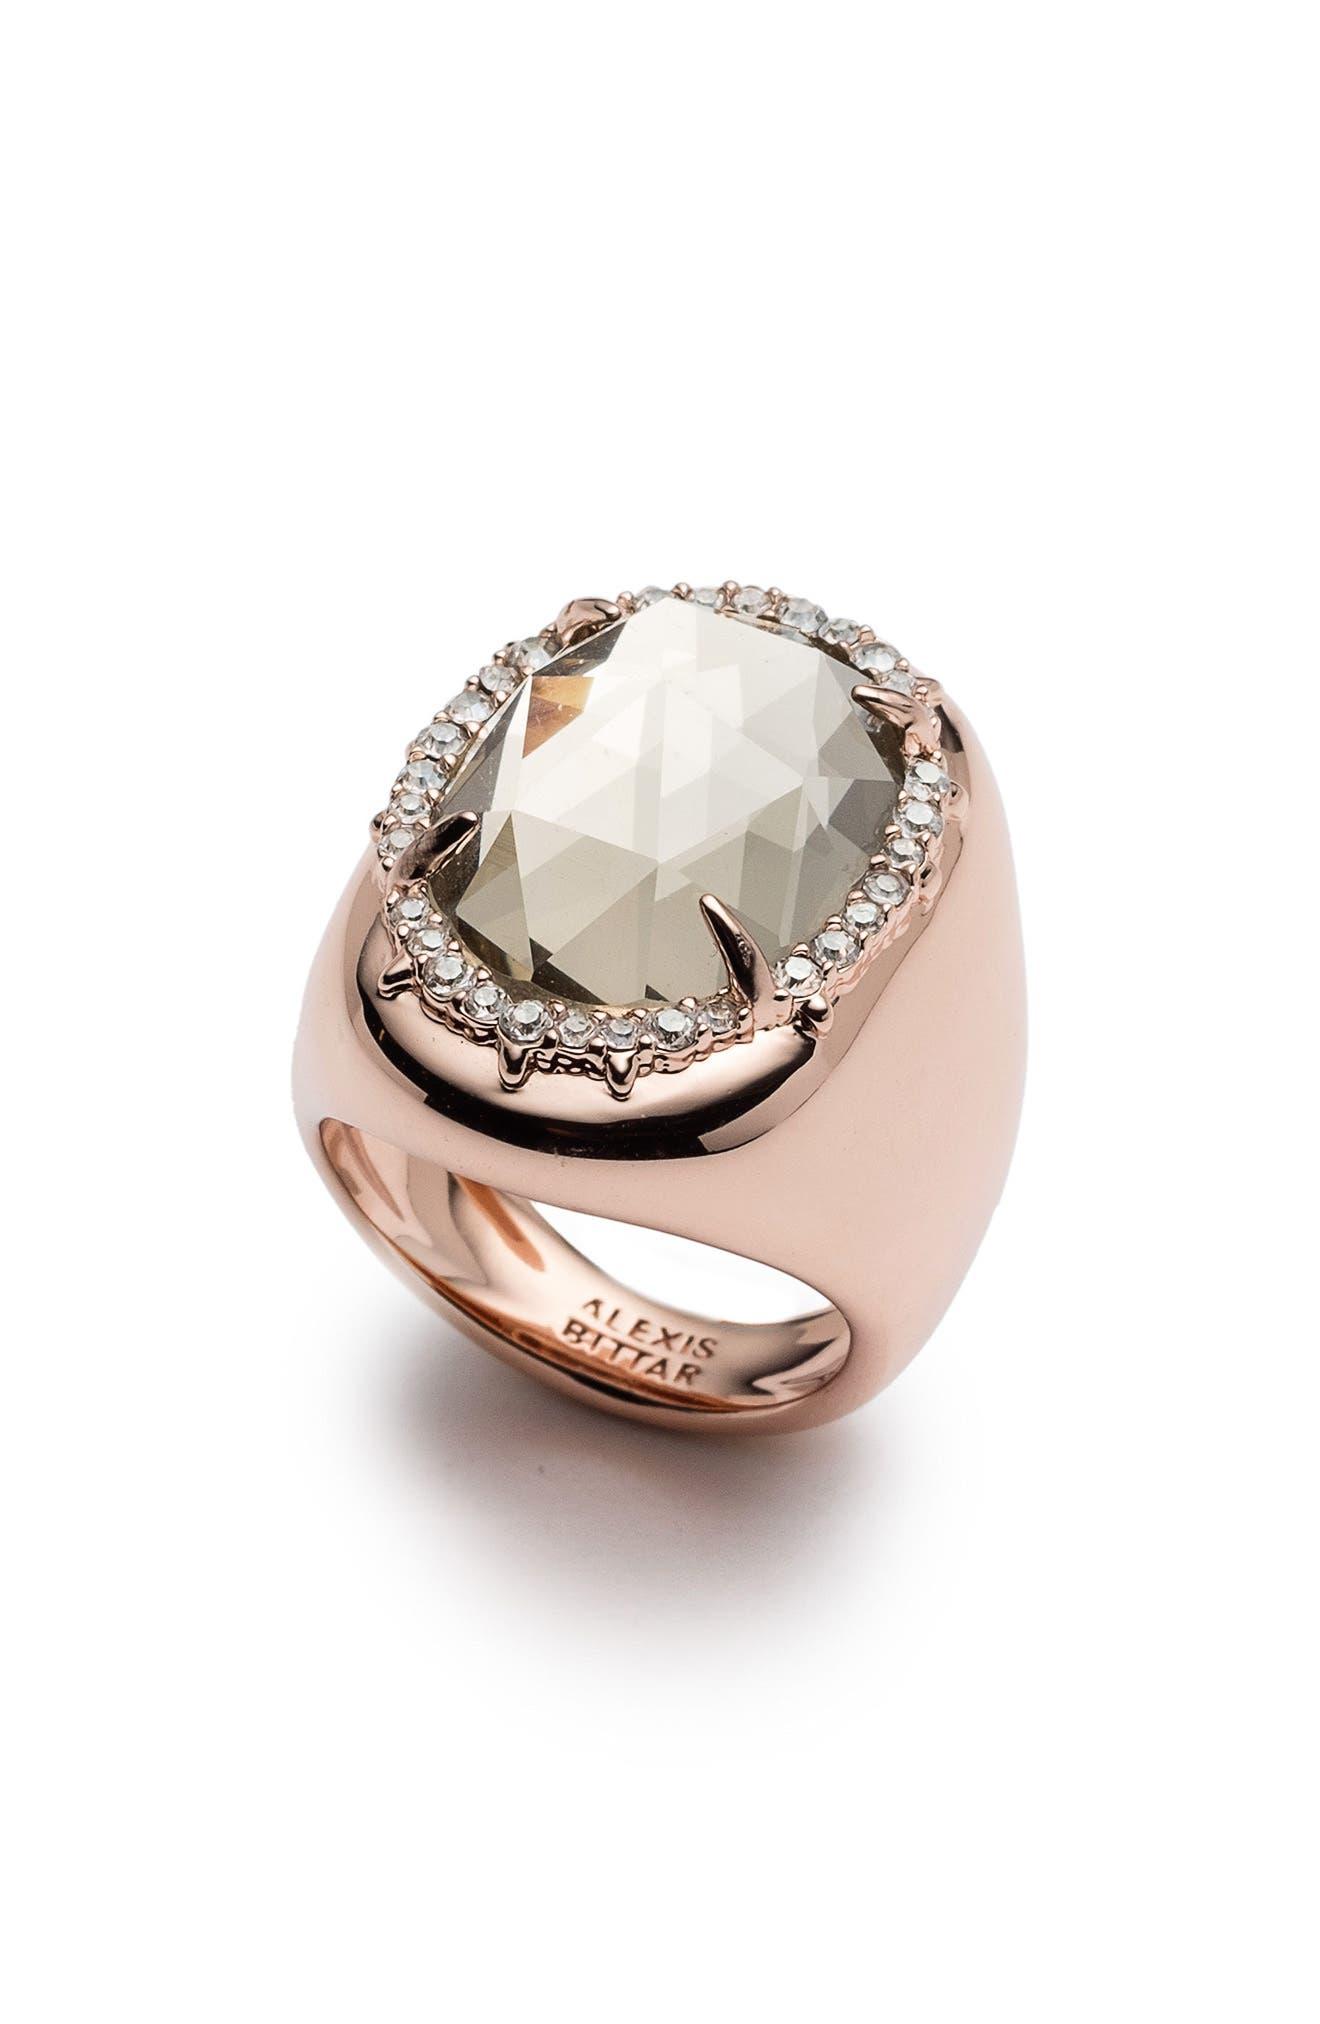 Halo Signet Ring,                             Main thumbnail 1, color,                             ROSE GOLD